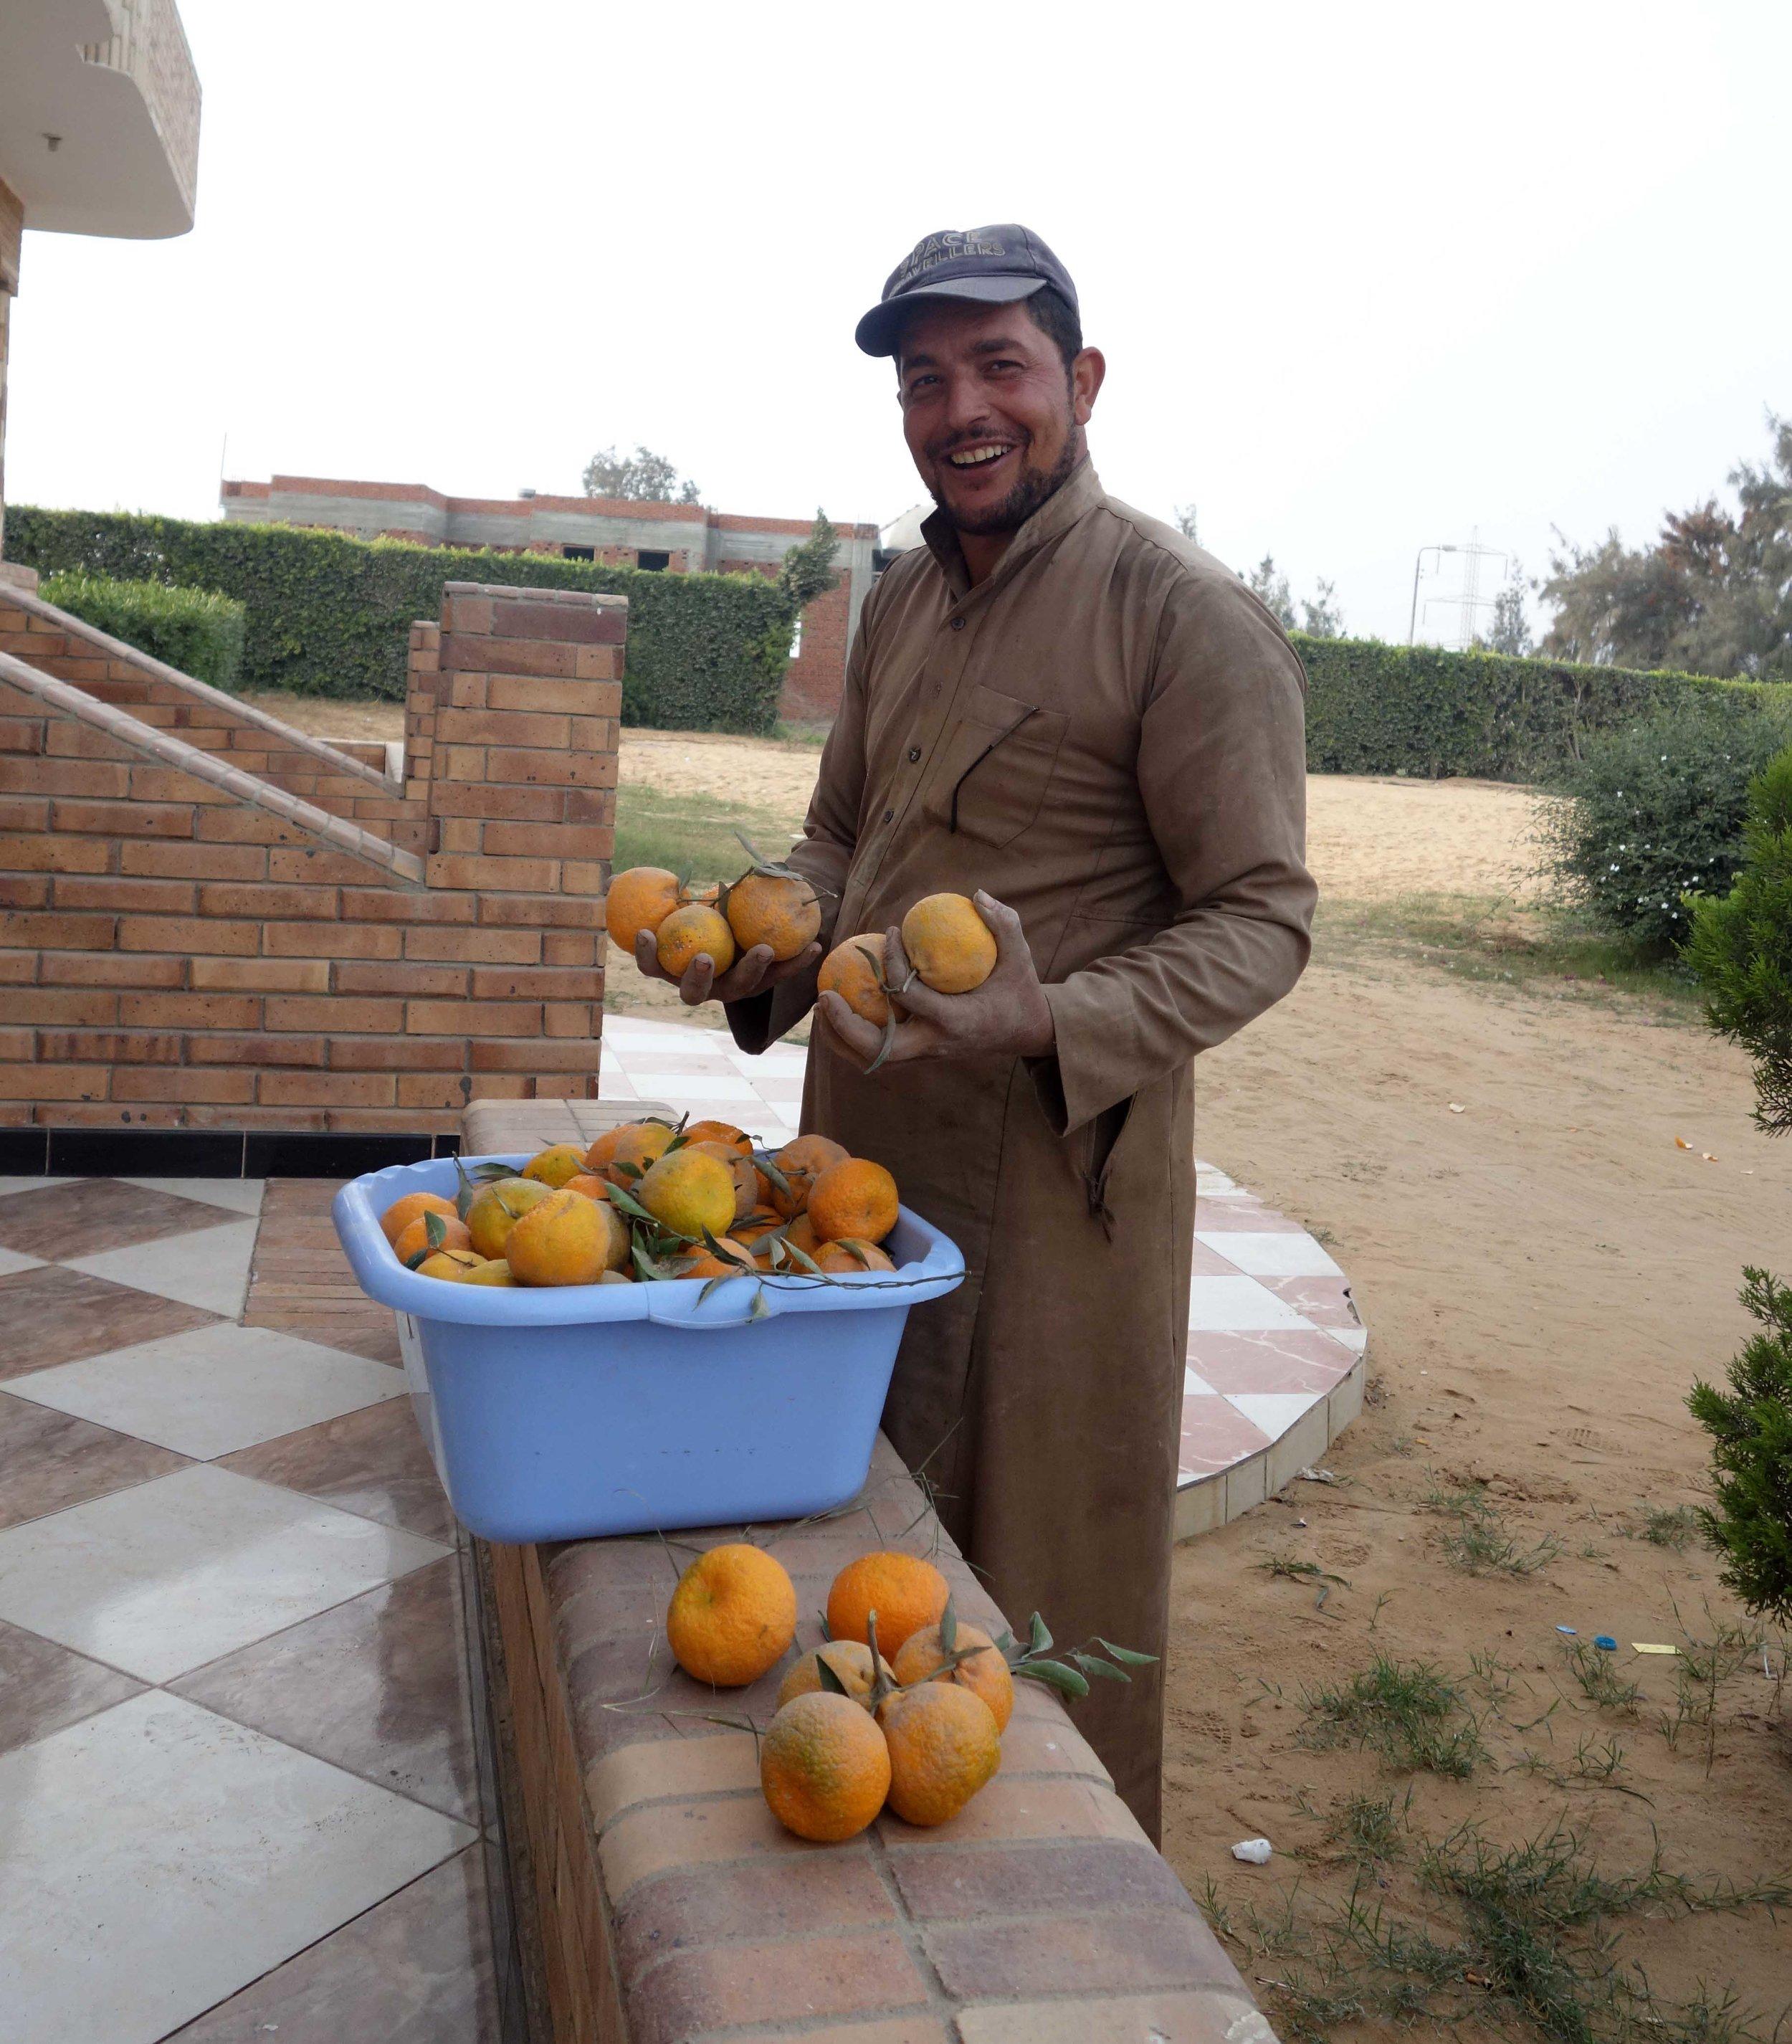 Merimde Beni Salama. Our daily ration of giant tangerines (photo: Giulio Lucarini)